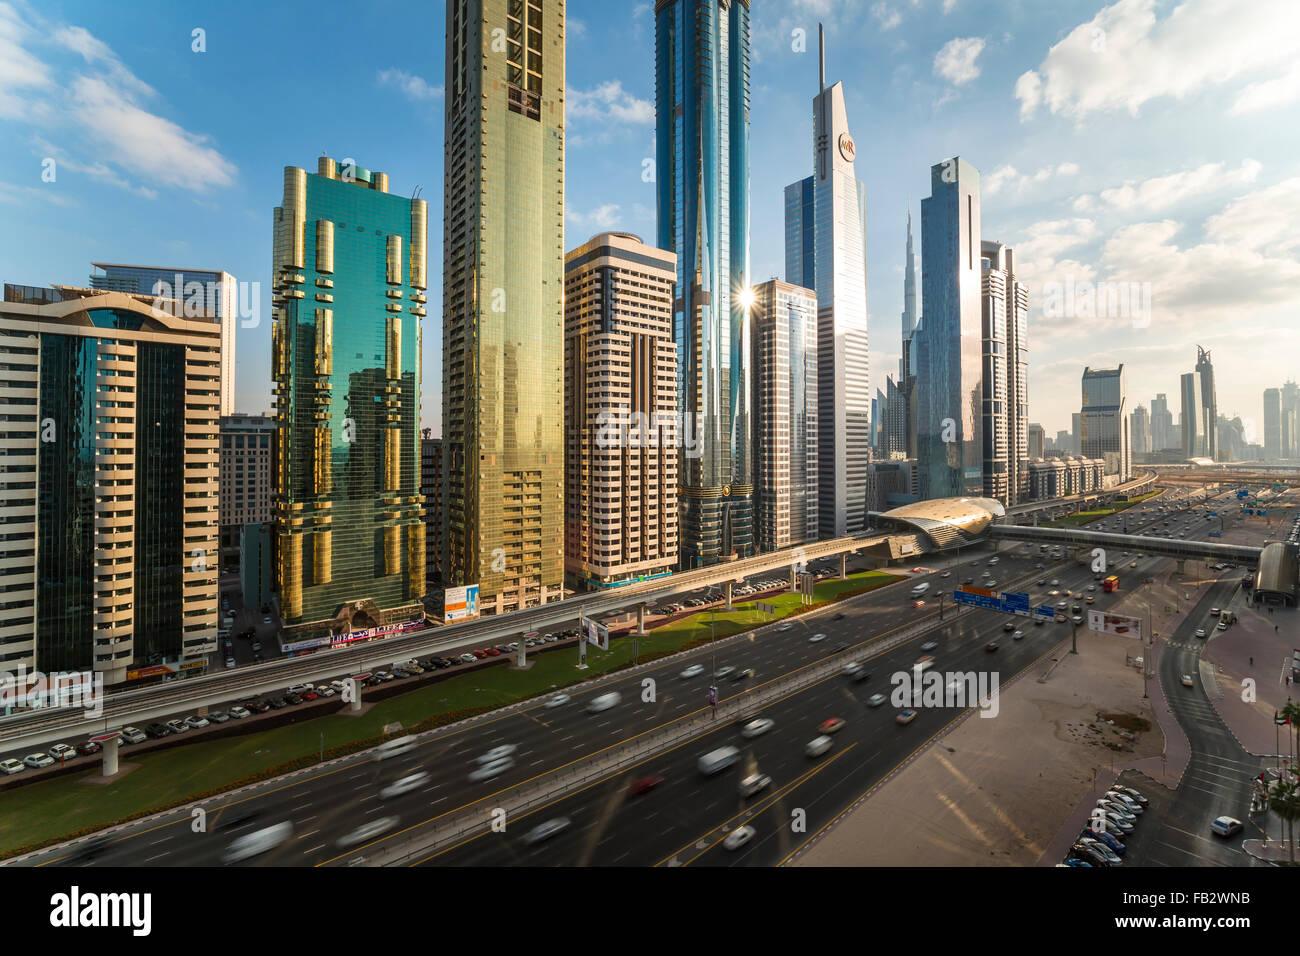 Los Emiratos Árabes Unidos, Dubai, Sheikh Zayed Rd, tráfico y nuevos edificios altos a lo largo de Dubai Imagen De Stock